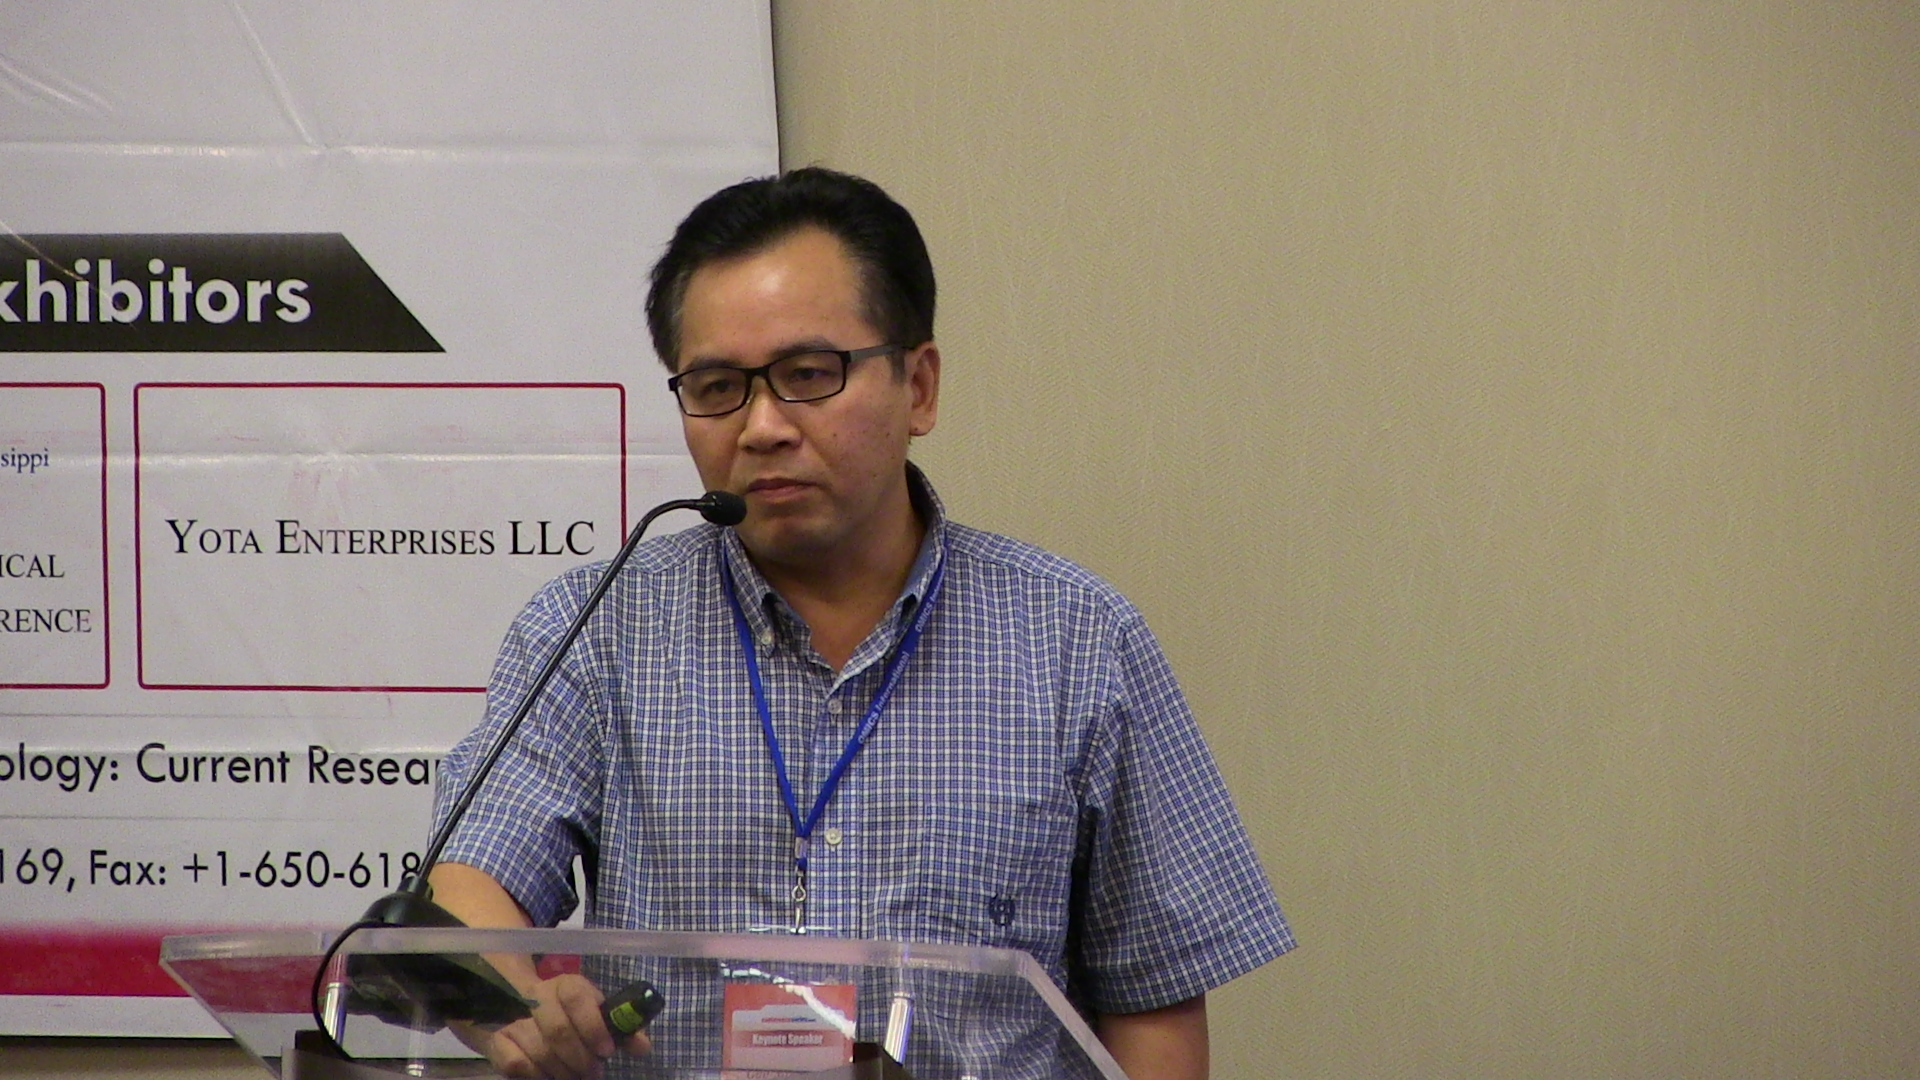 Guo-Min Deng | Conferenceseries Ltd